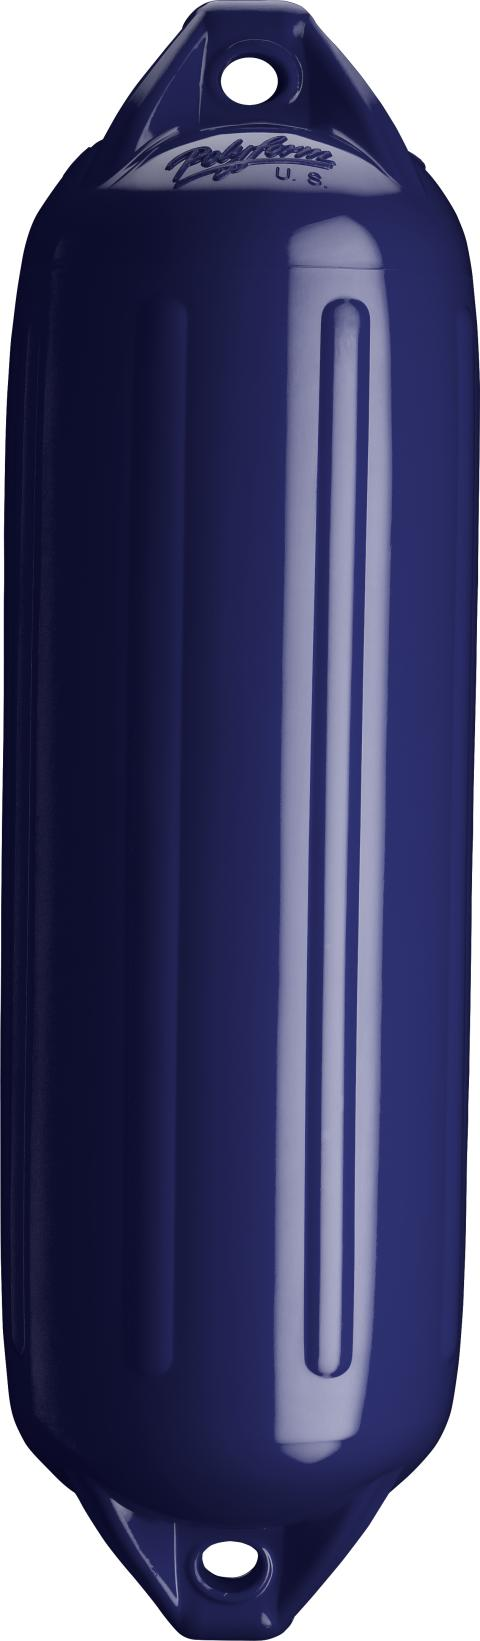 Polyform US : NF-fender NF4 navy